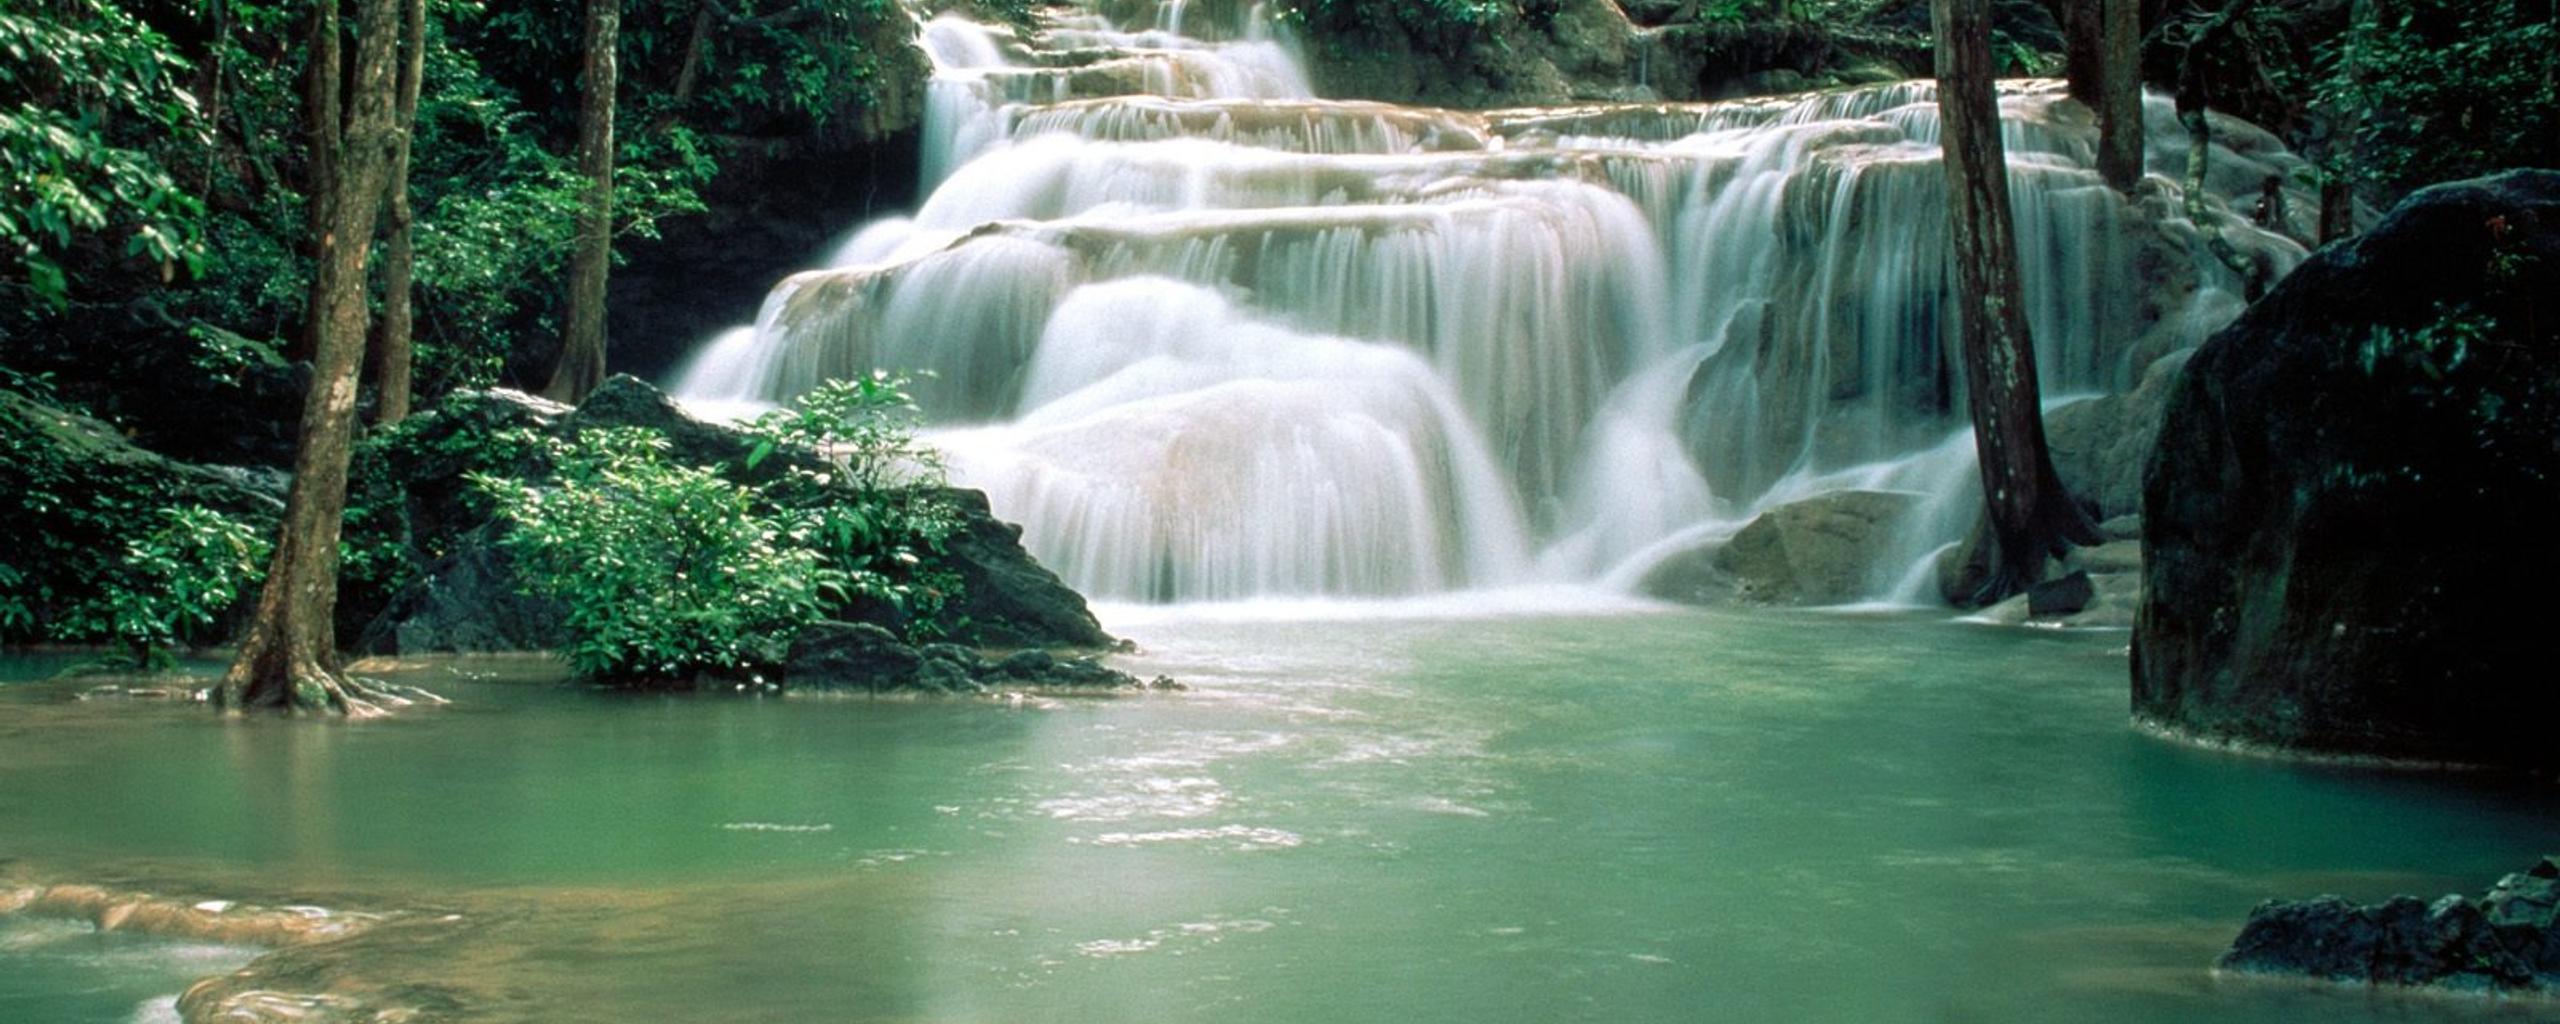 Download Wallpaper 2560x1024 Cold mountain river - HD beautiful nature wallpaper